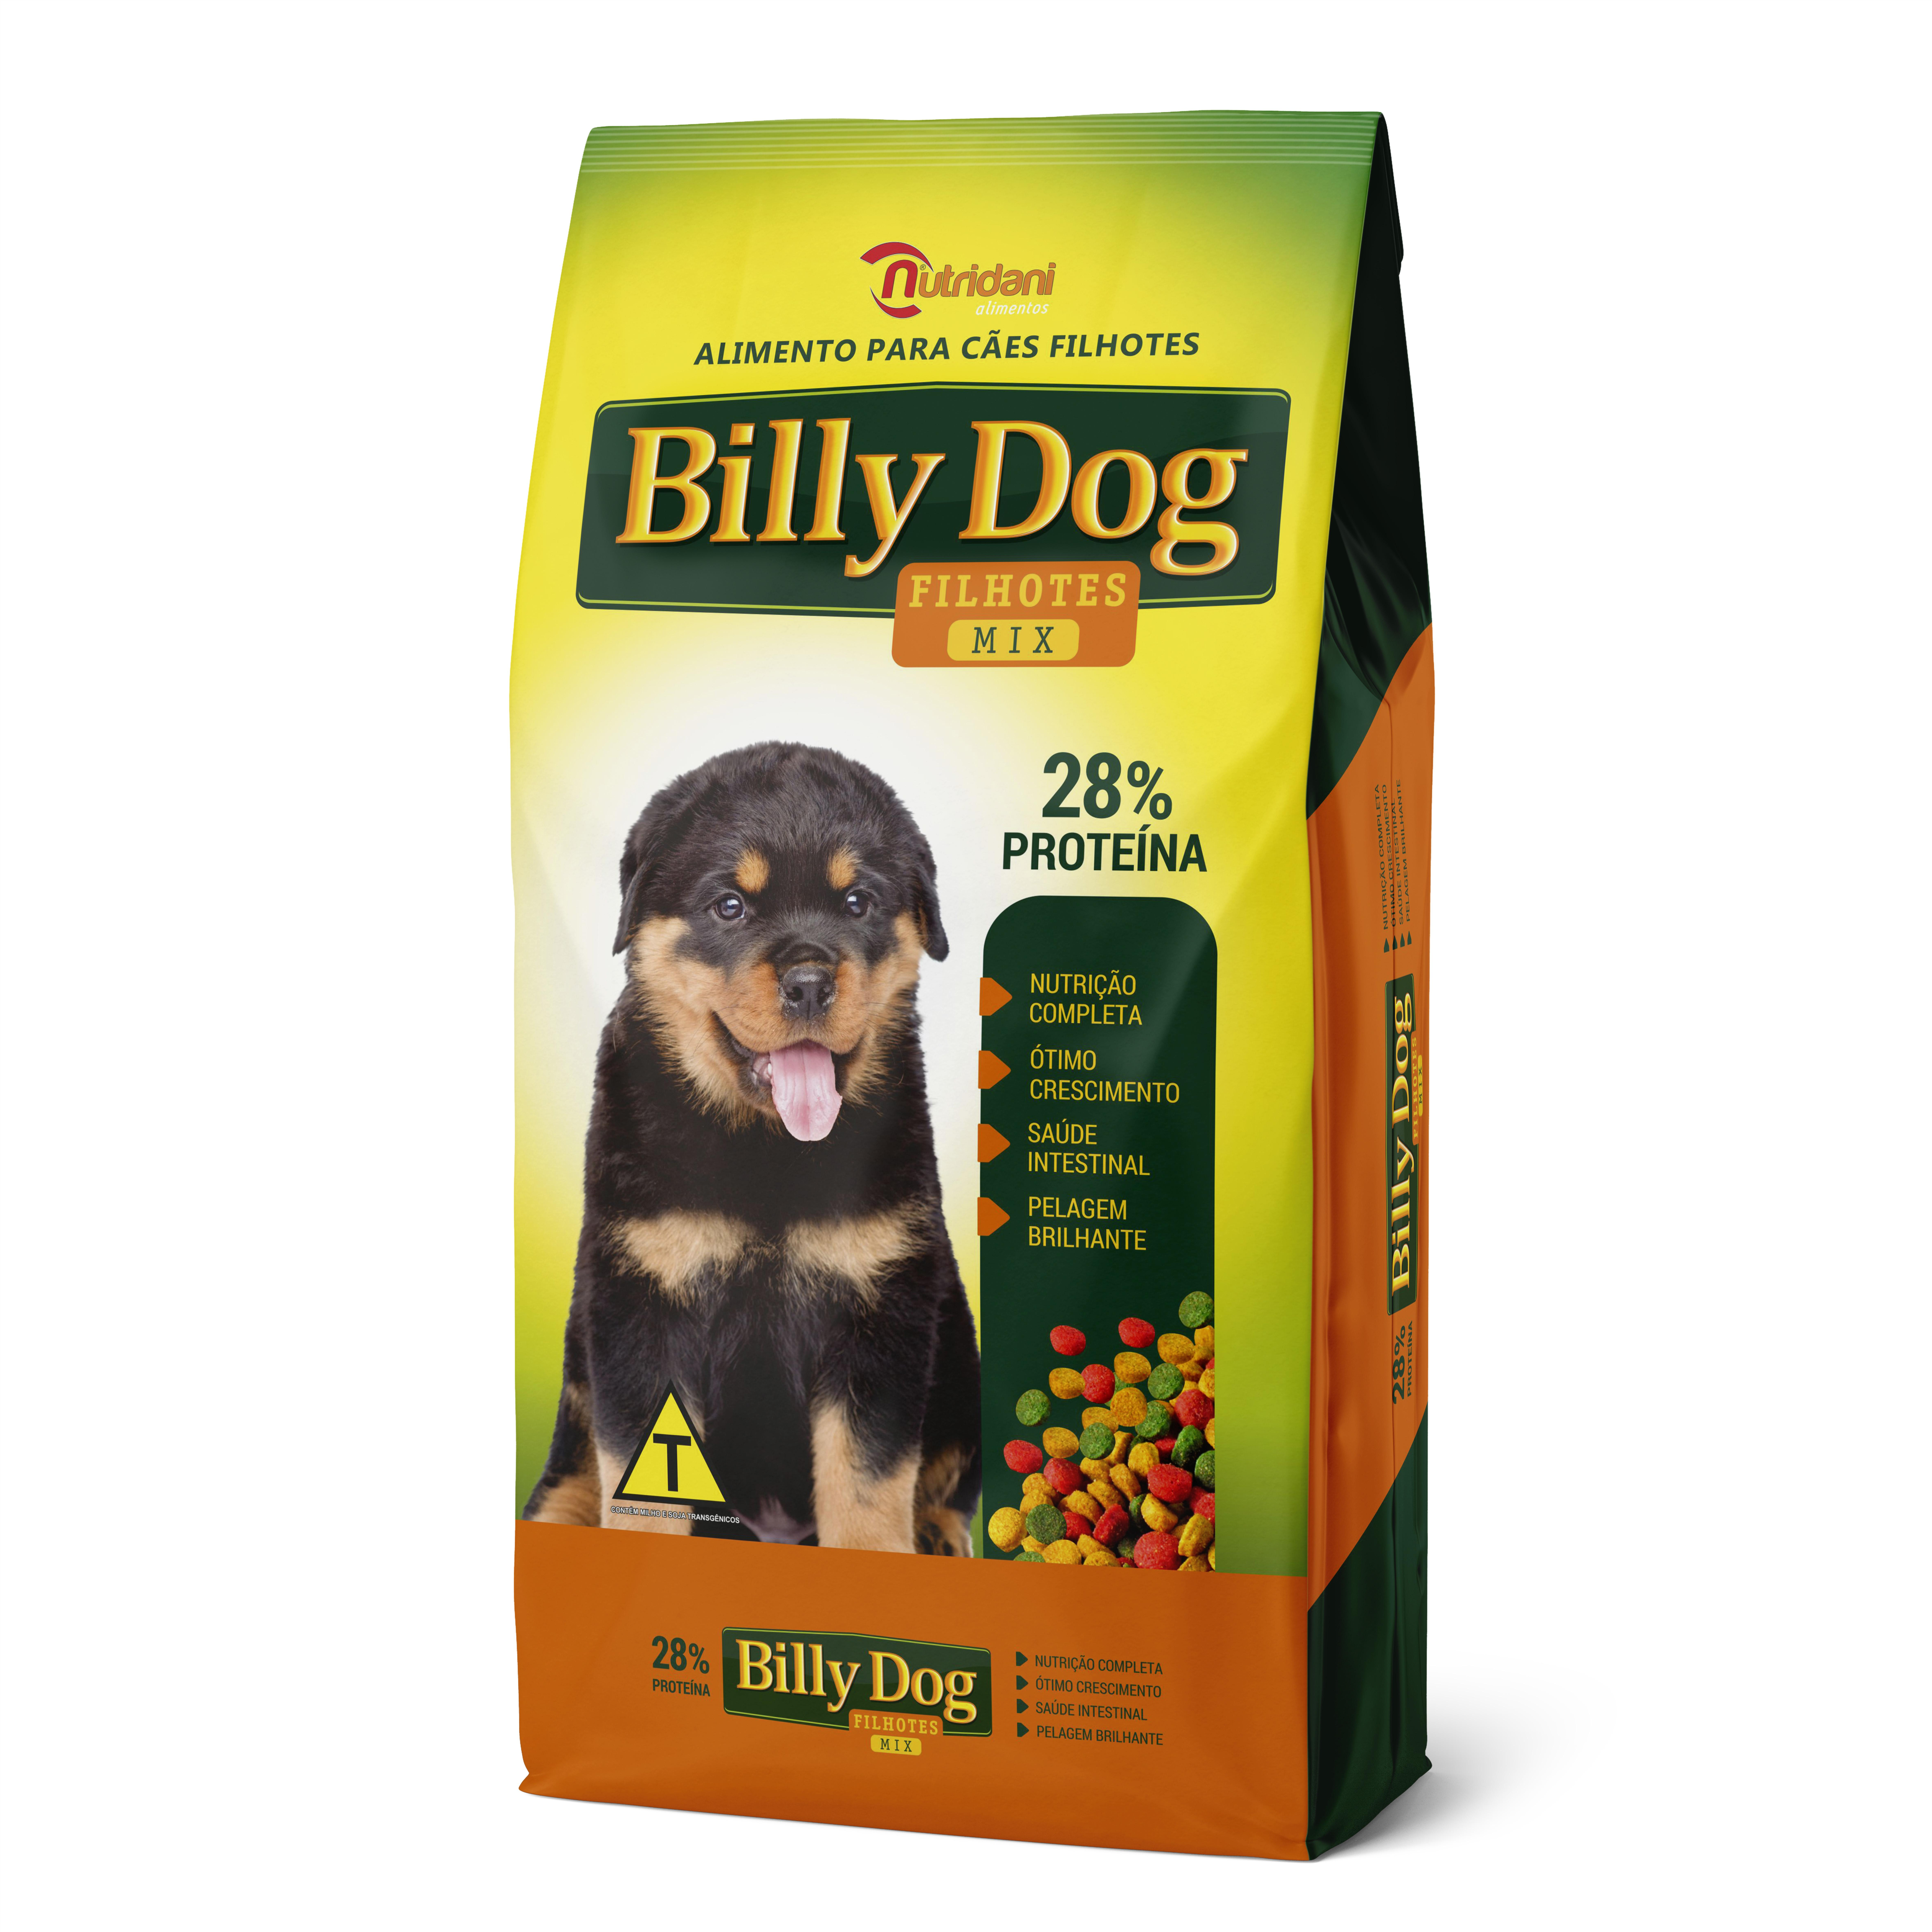 Billy Dog Filhotes Mix